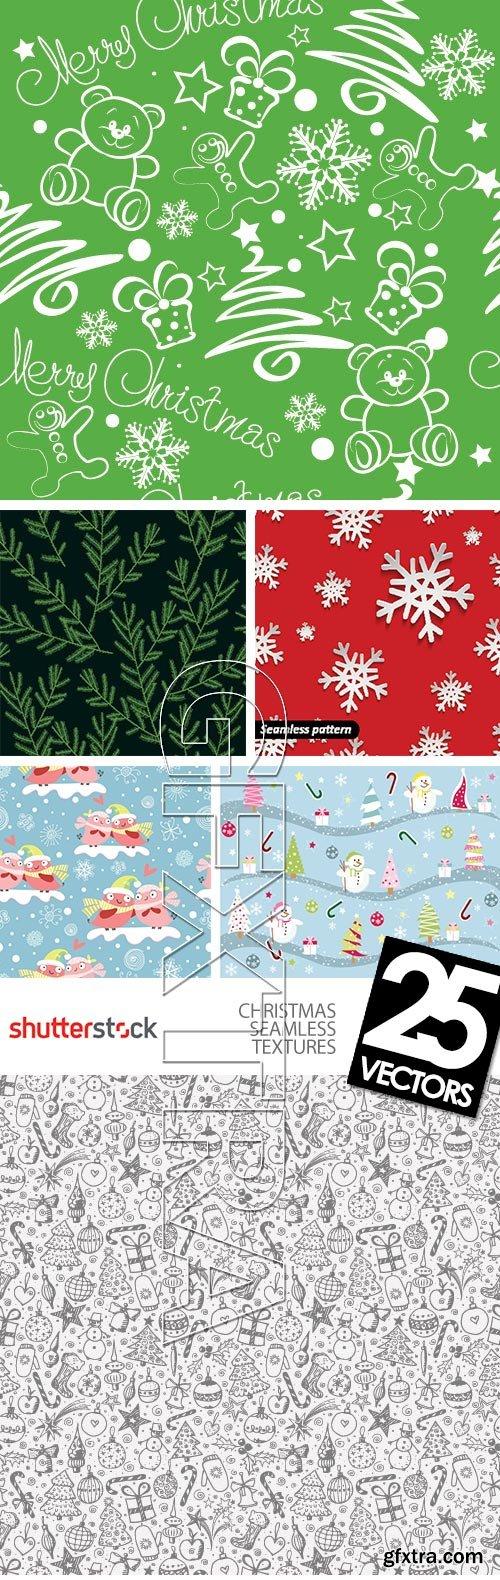 Christmas Seamless Textures 25xEPS